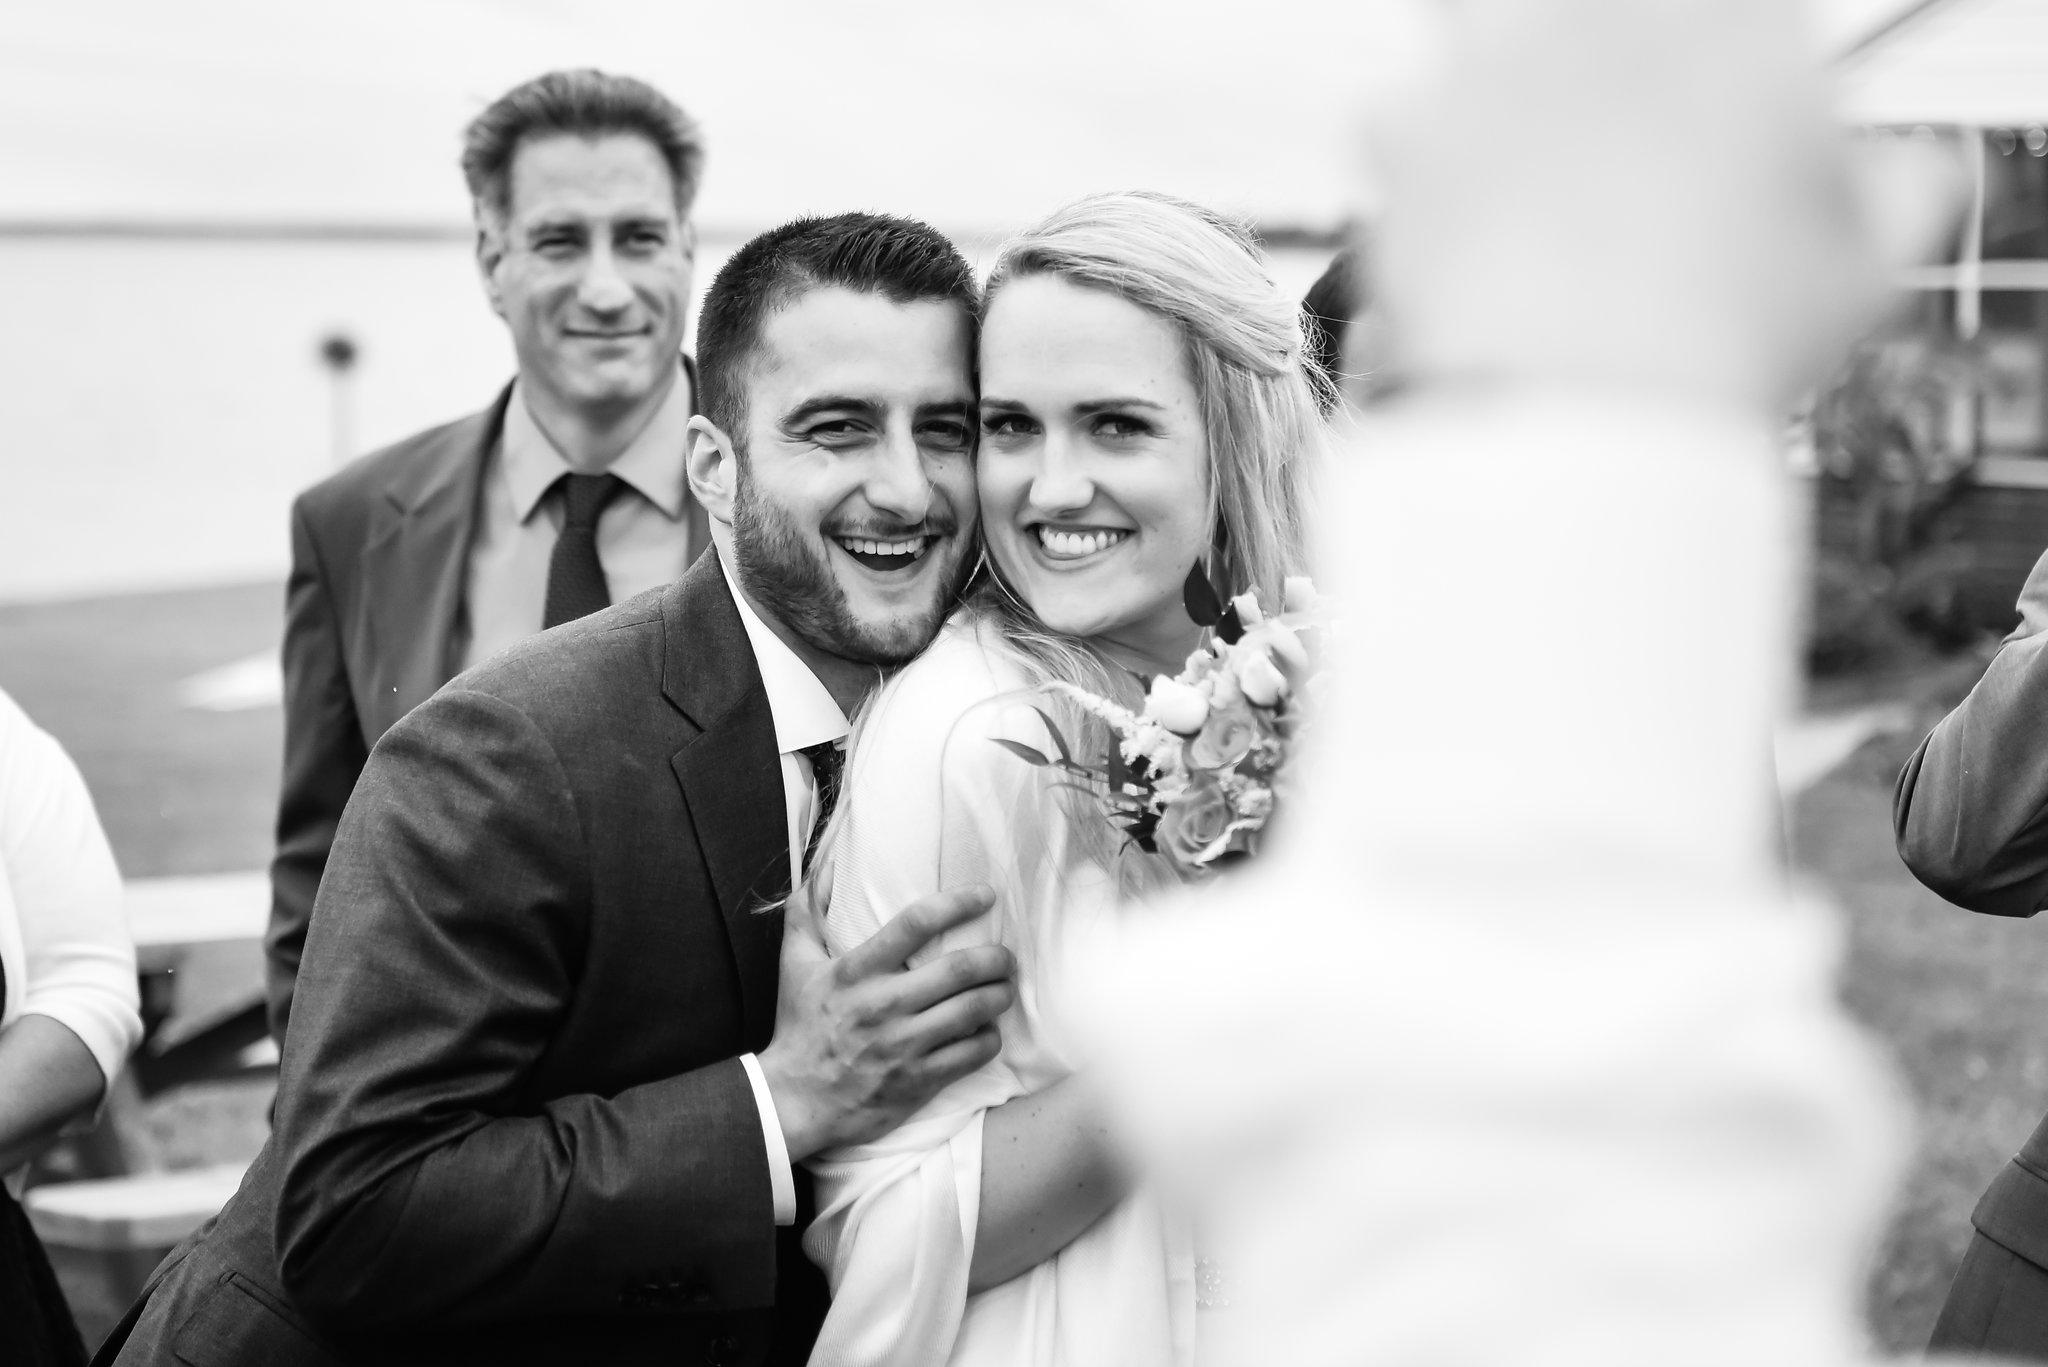 brielle-davis-events-weatherly-farm-waterfront-wedding-reception-00027.jpg